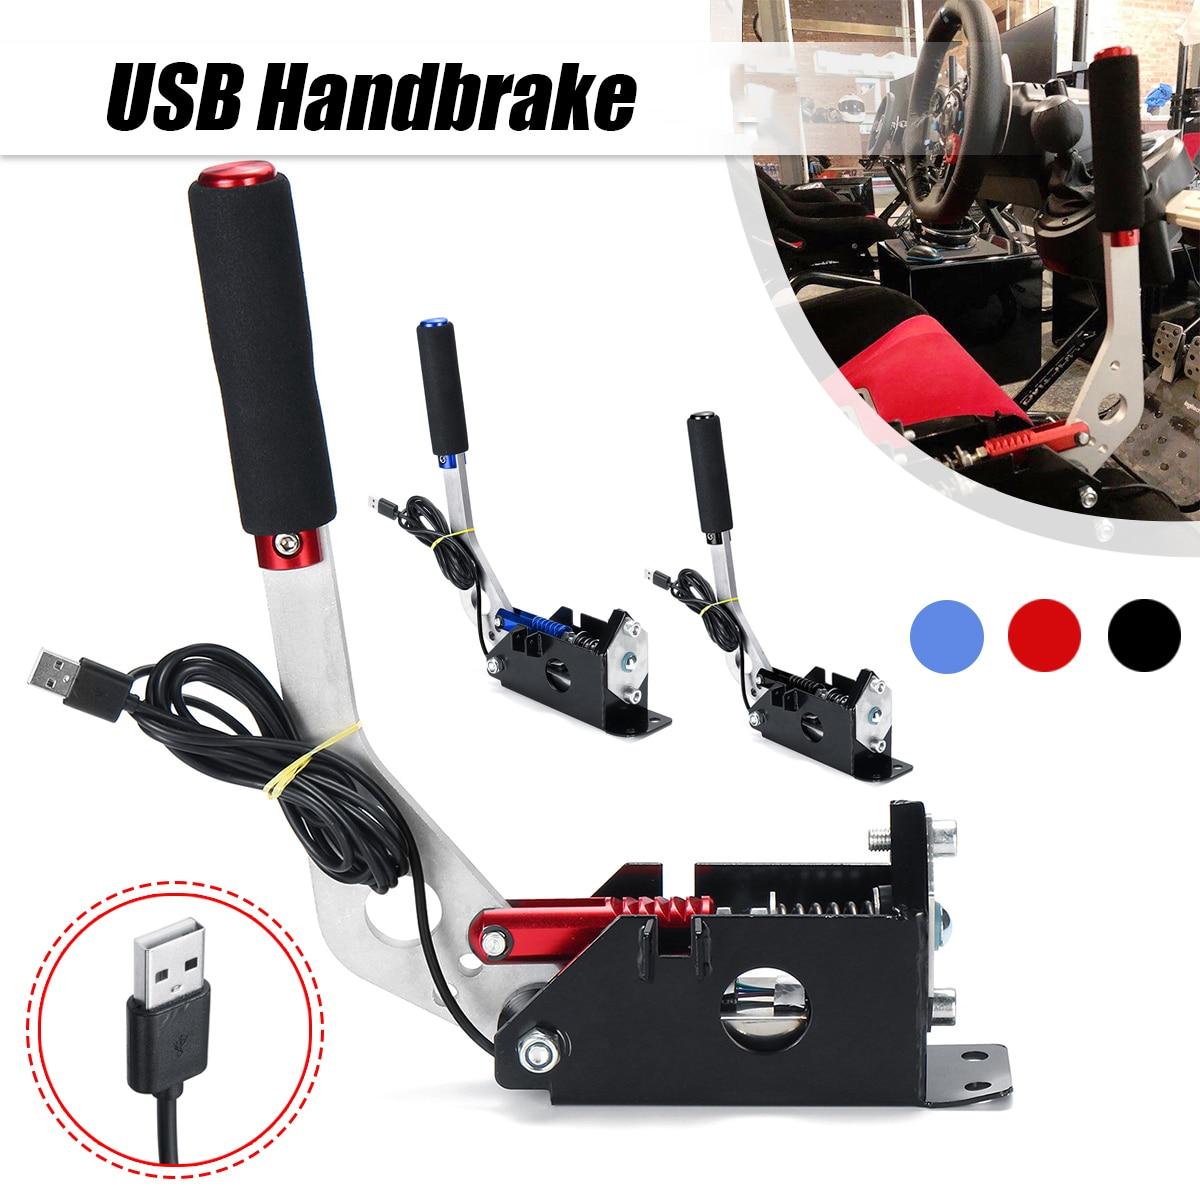 CNC Aluminum PC Gmae USB Handbrake for Sim Racing Game for Logitech G25 G27 G29 T500 T300 FANATECOSW for LFS DIRT RALLY